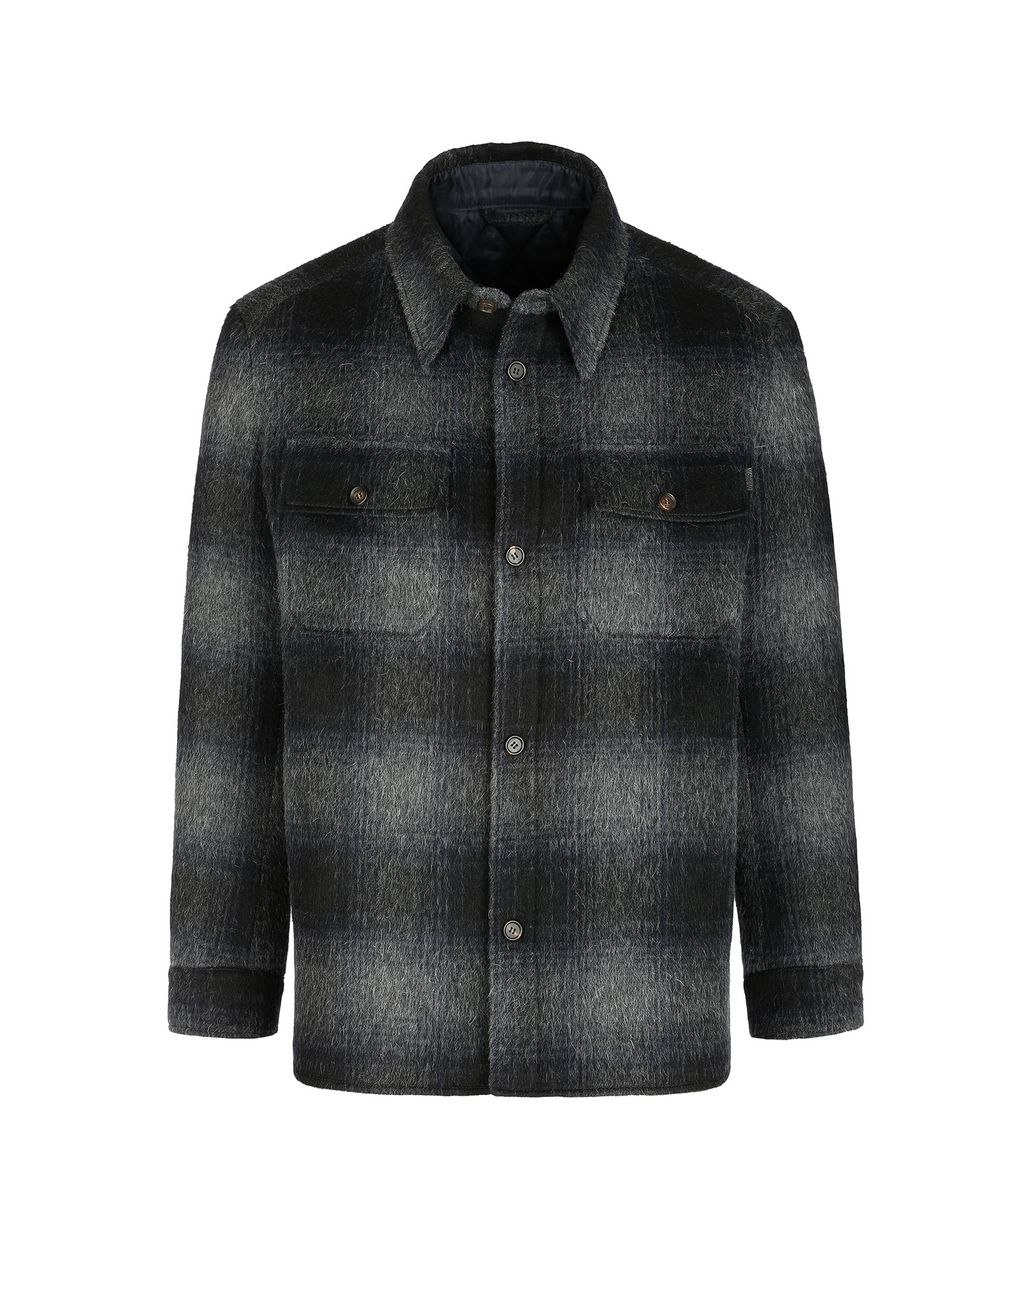 BRIONI Канадская куртка антрацитового цвета Верхняя одежда [*** pickupInStoreShippingNotGuaranteed_info ***] f